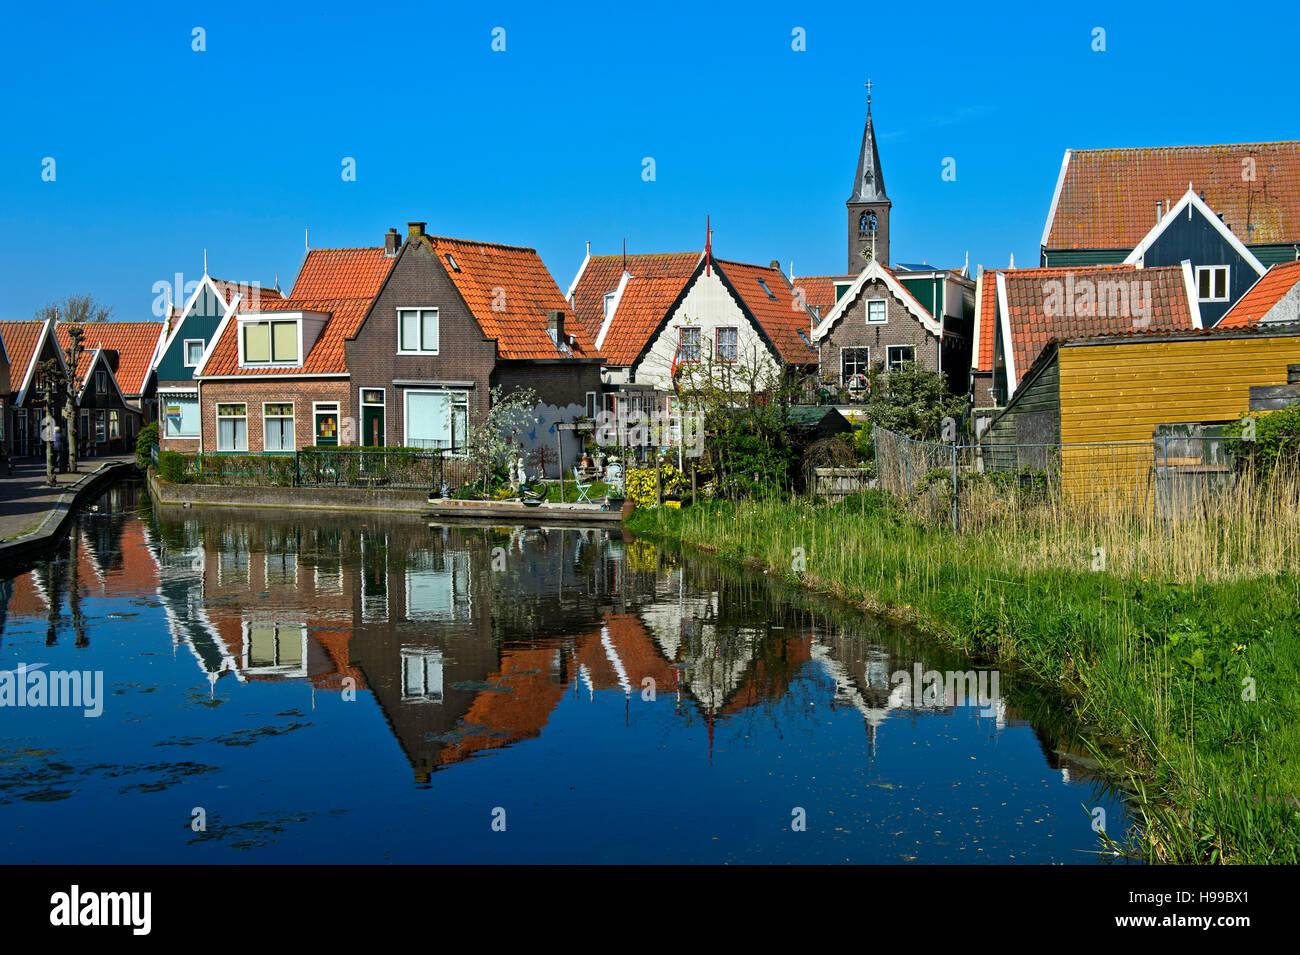 Romantic corner in Volendamm, North Holland, Netherlands - Stock Image